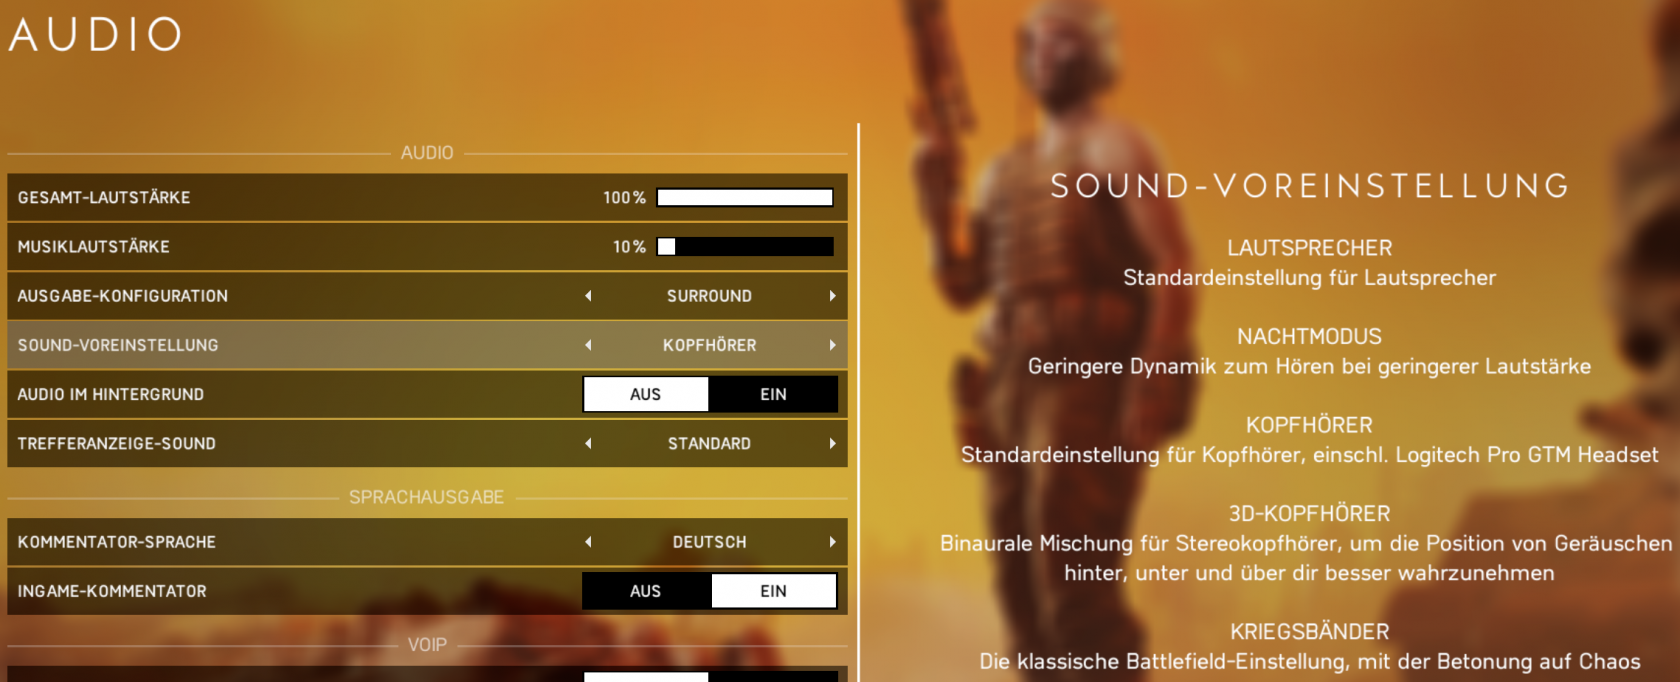 battlefield 5 audio sound voreinstellung lautsprecher nachtmodus kopfhoerer 3d kopfhoerer kriegsbaender